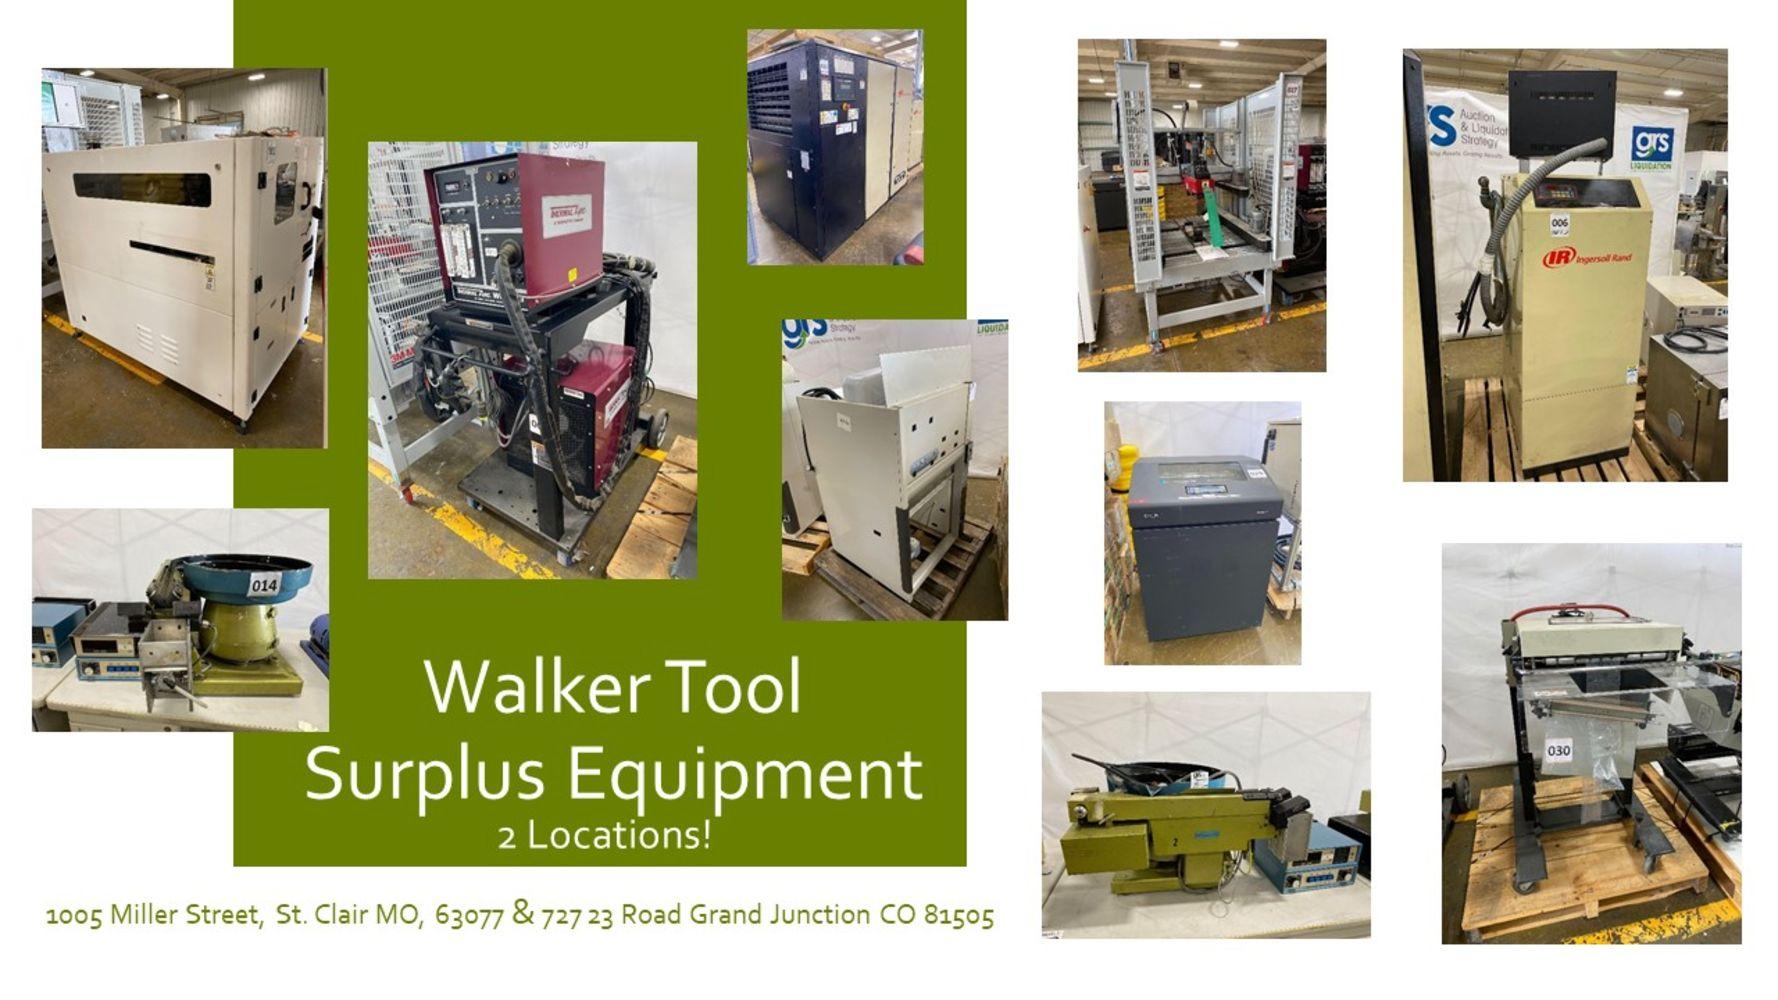 Walker Tool Surplus Packaging and Manufacturing Equipment